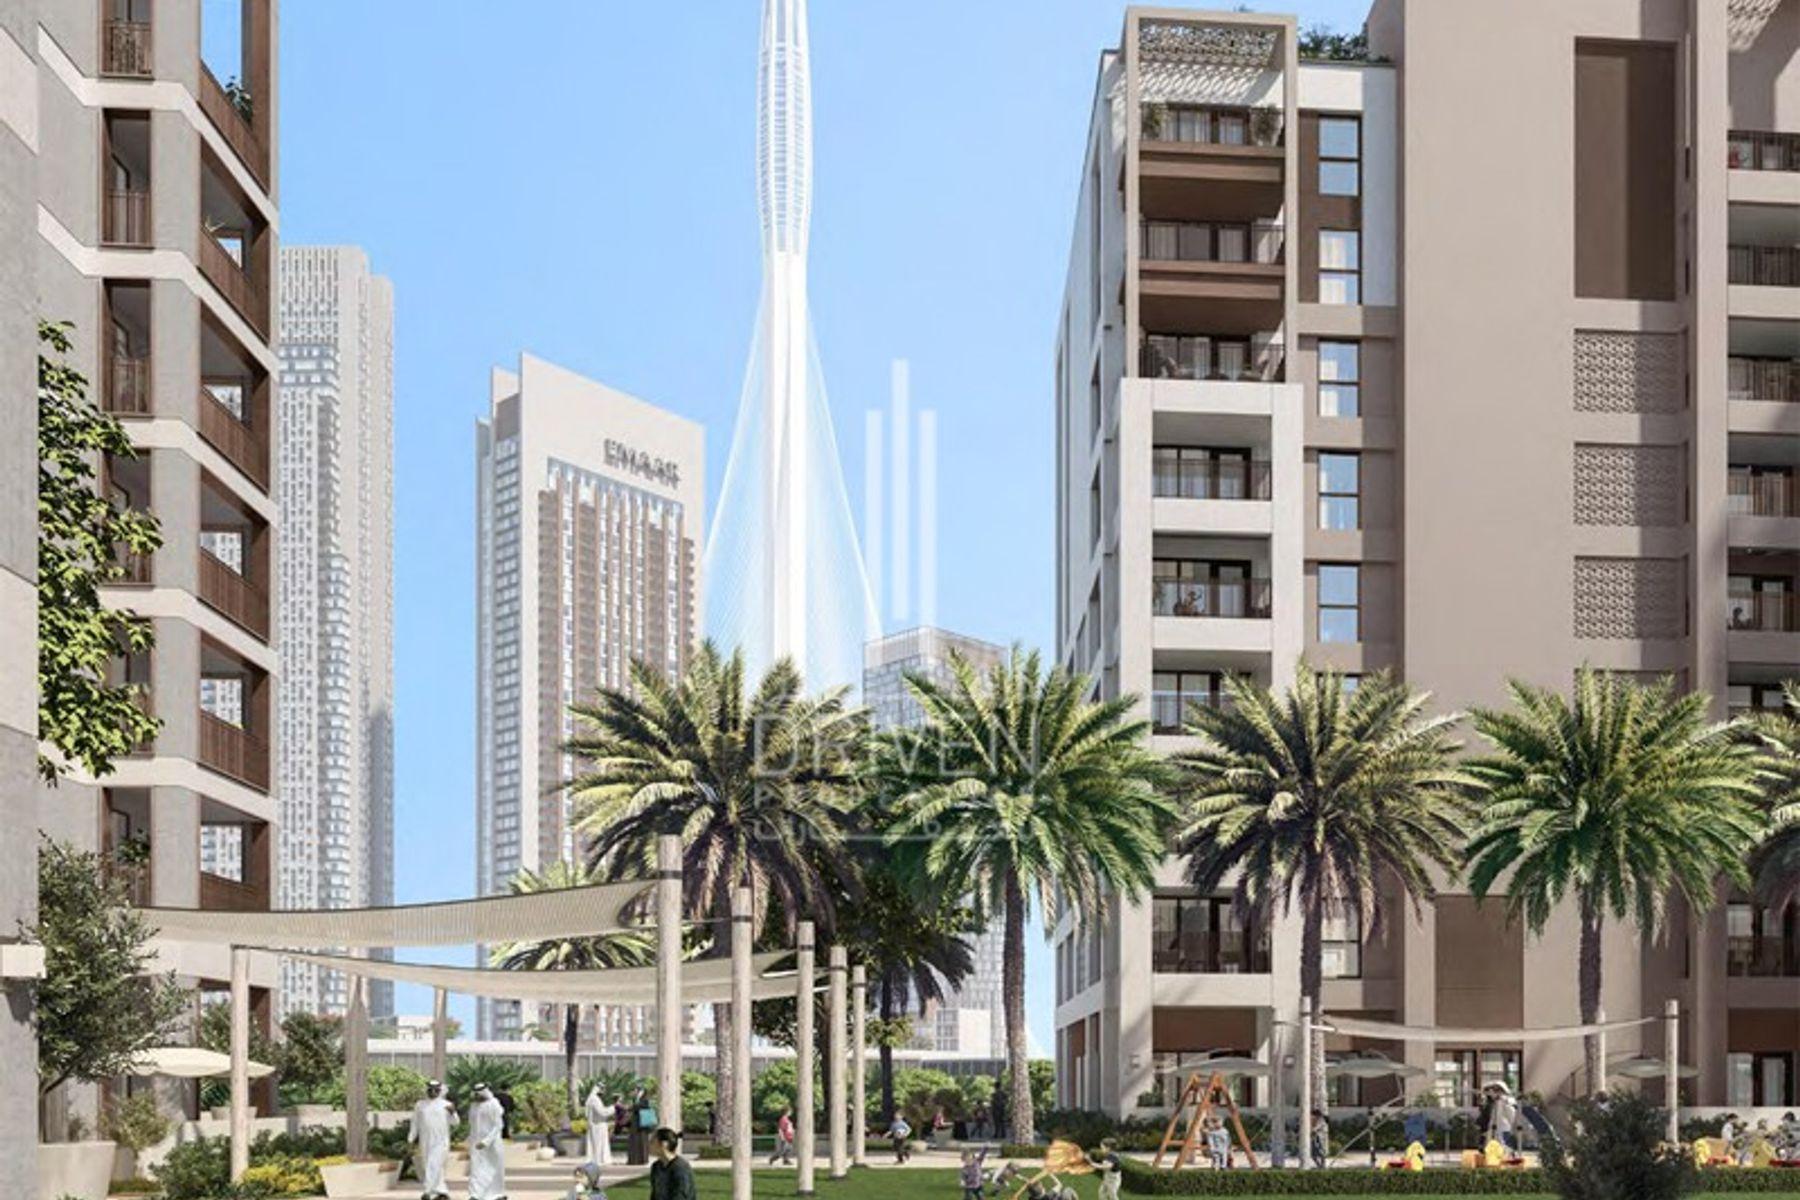 Apartment for Sale in Summer, Dubai Creek Harbour